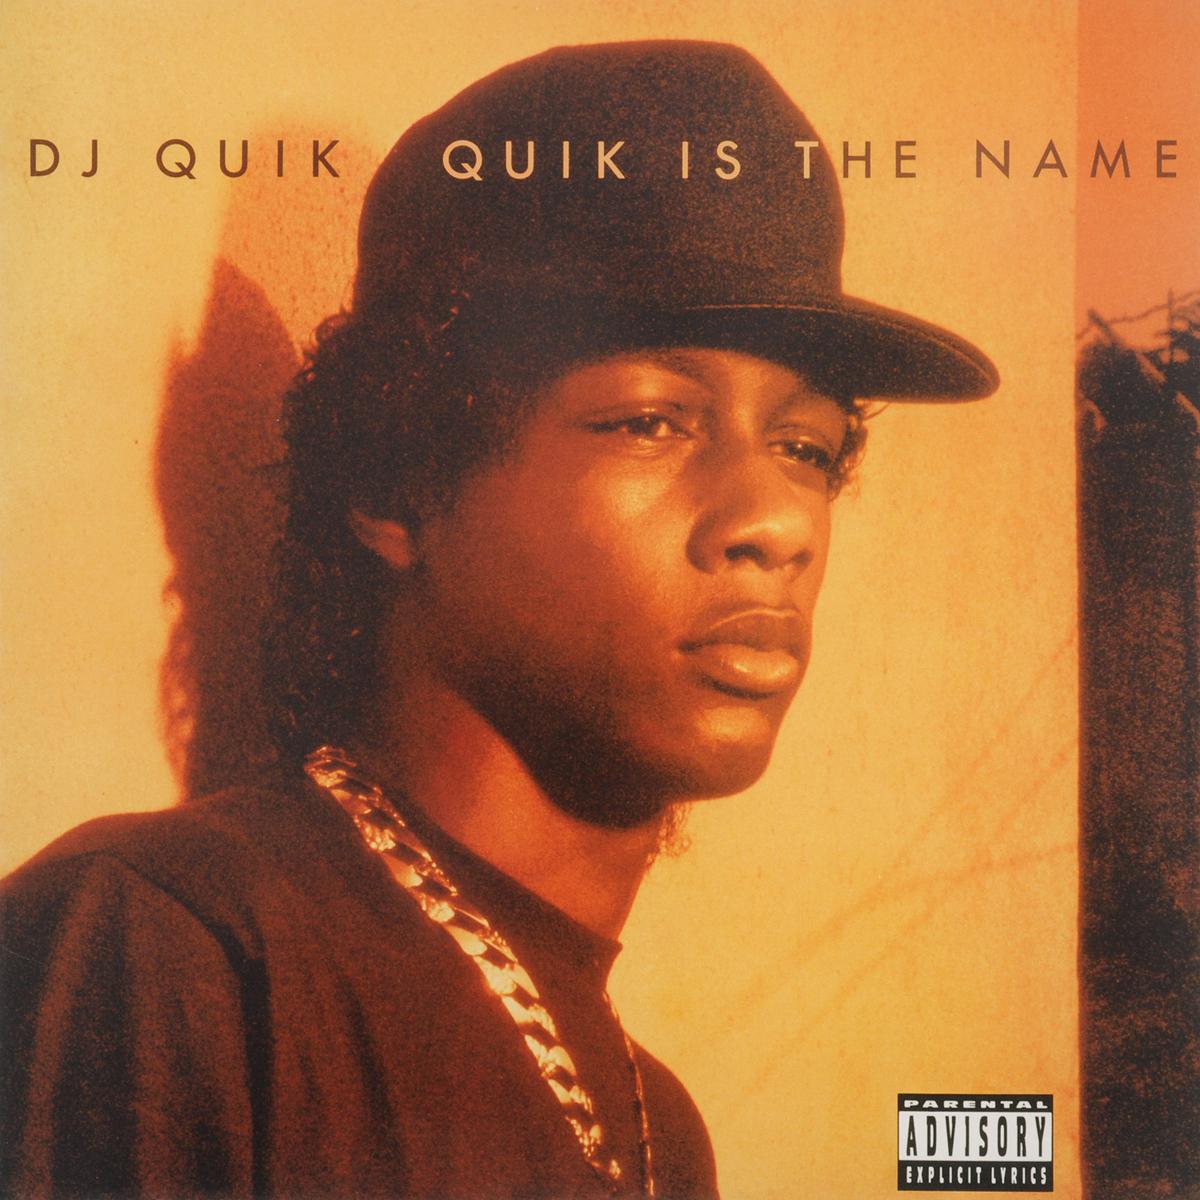 DJ Quik Dj Quik. Quik Is The Name (LP) журнал сделок для quik александр резвяков скачать